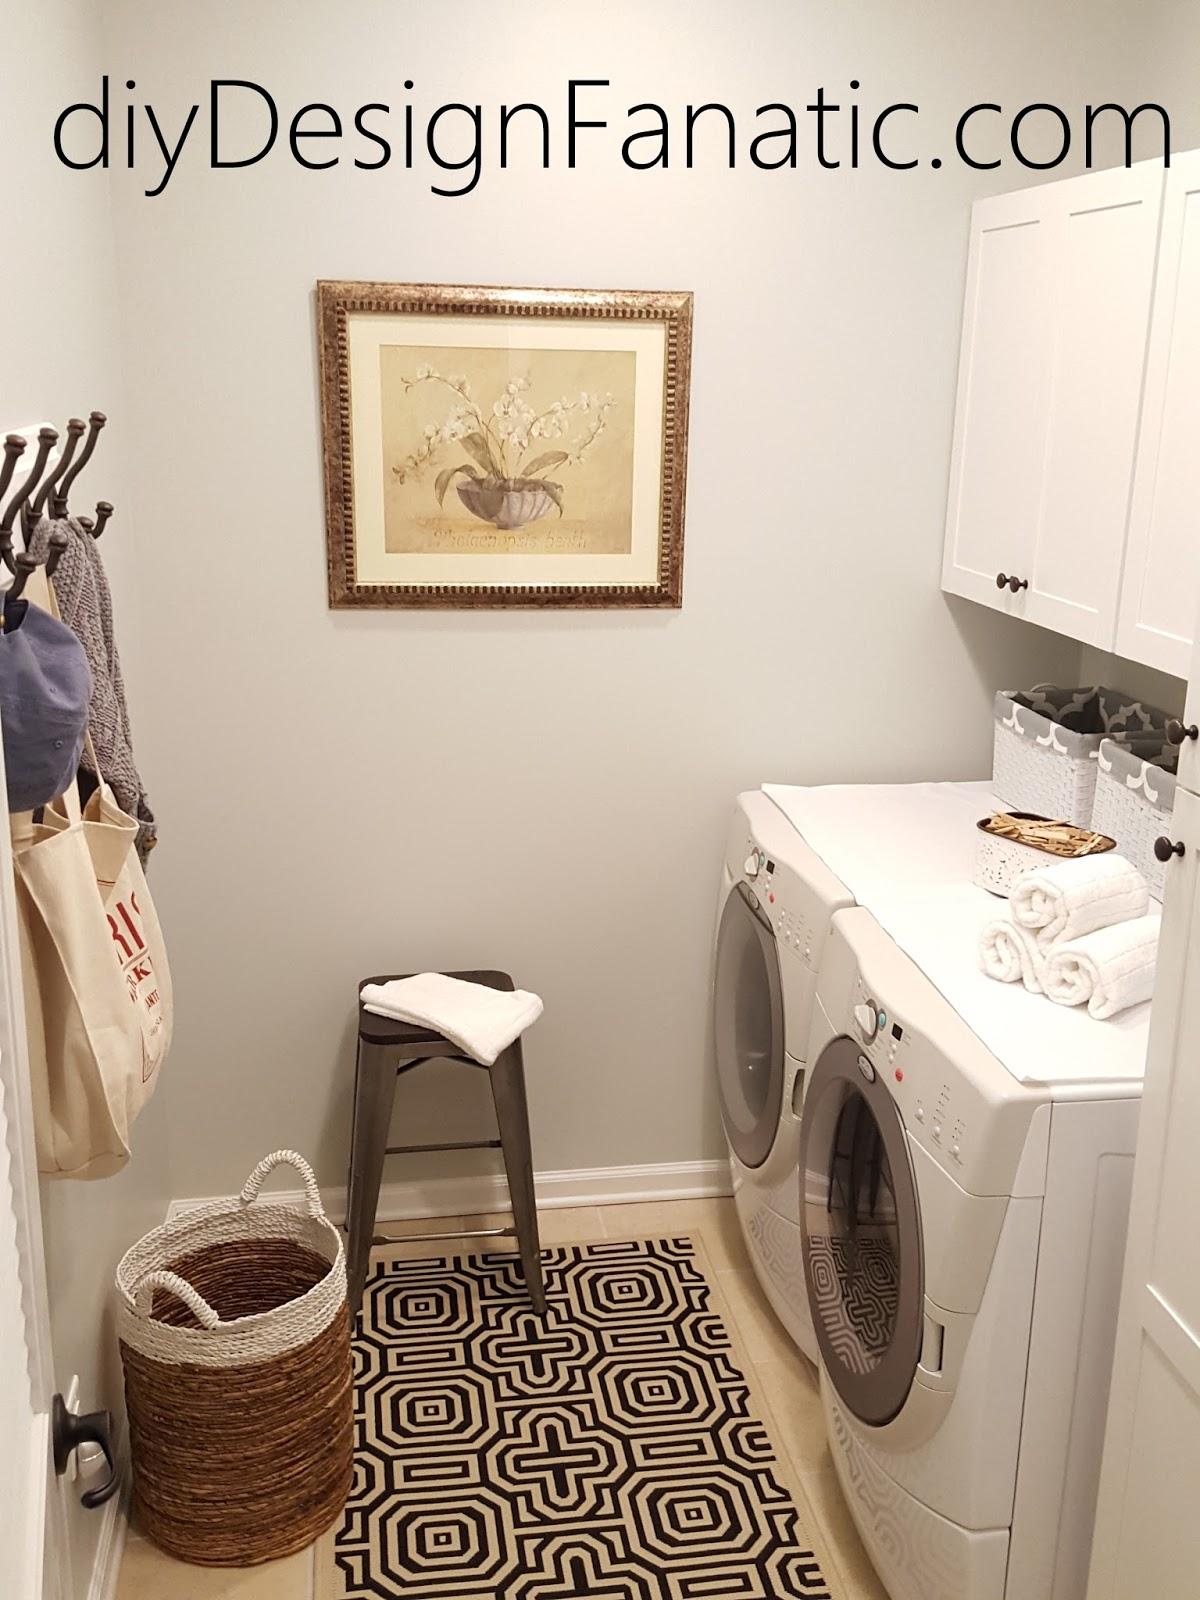 diy design fanatic zhushing up a corner of the laundry room